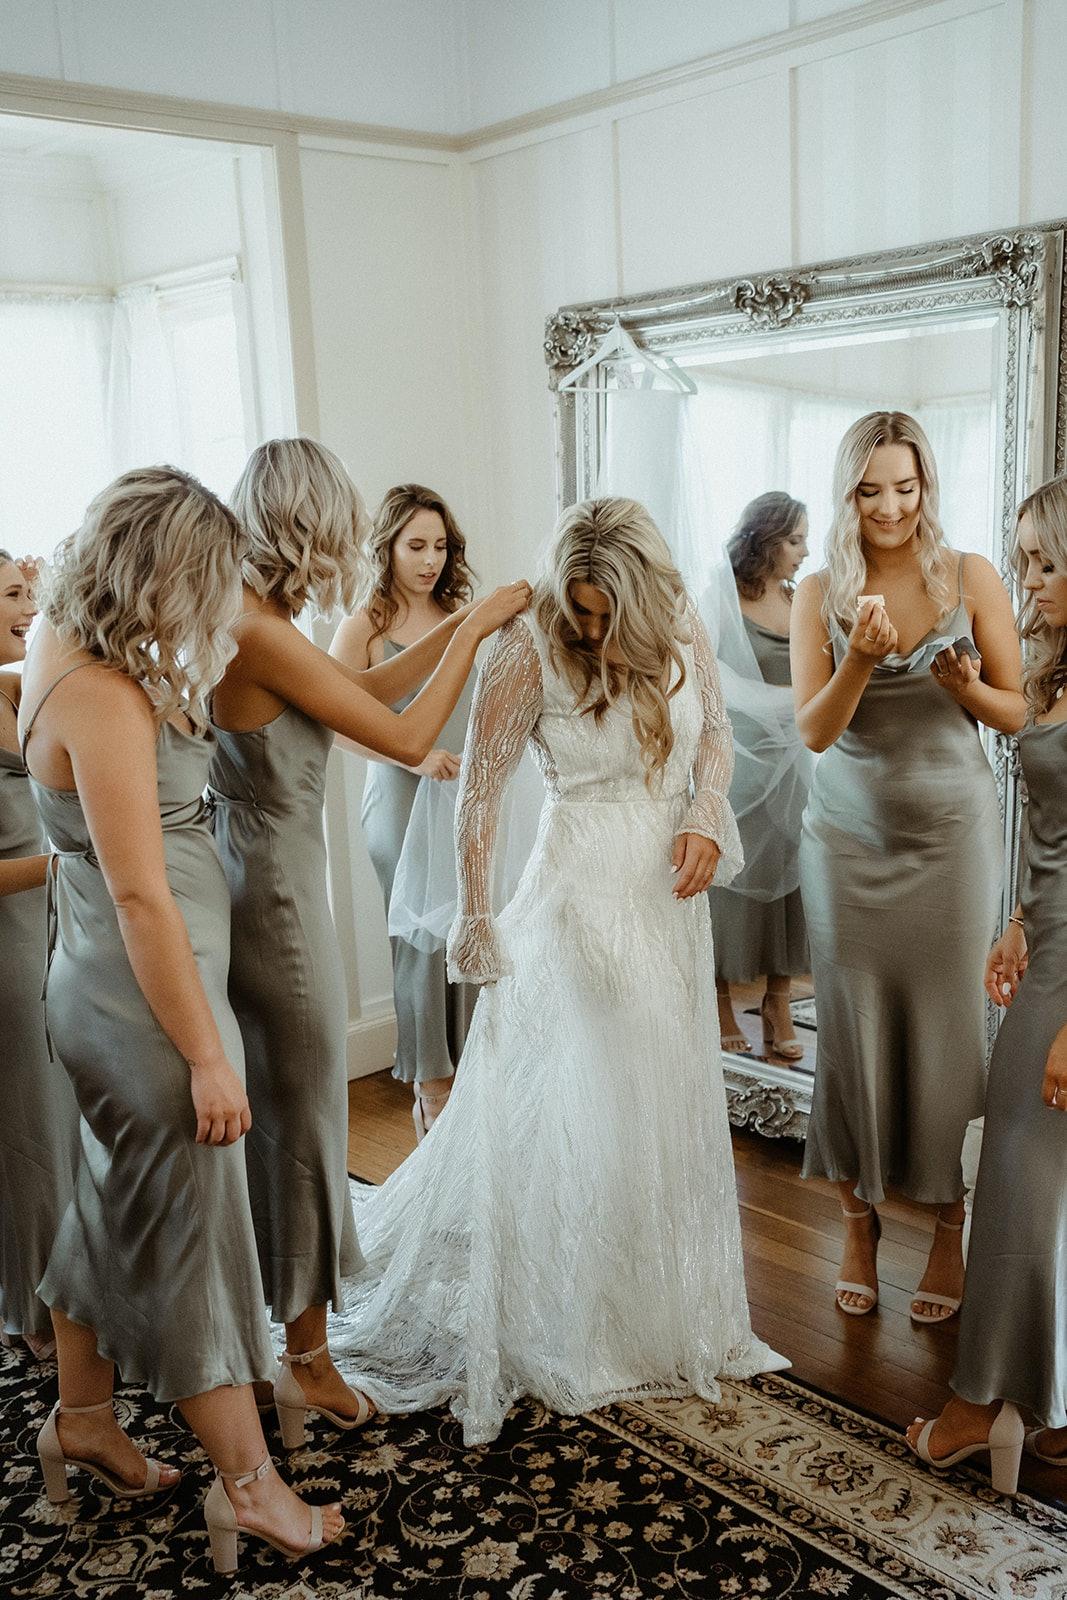 Bride getting ready in Bride's retreat with bridesmaids